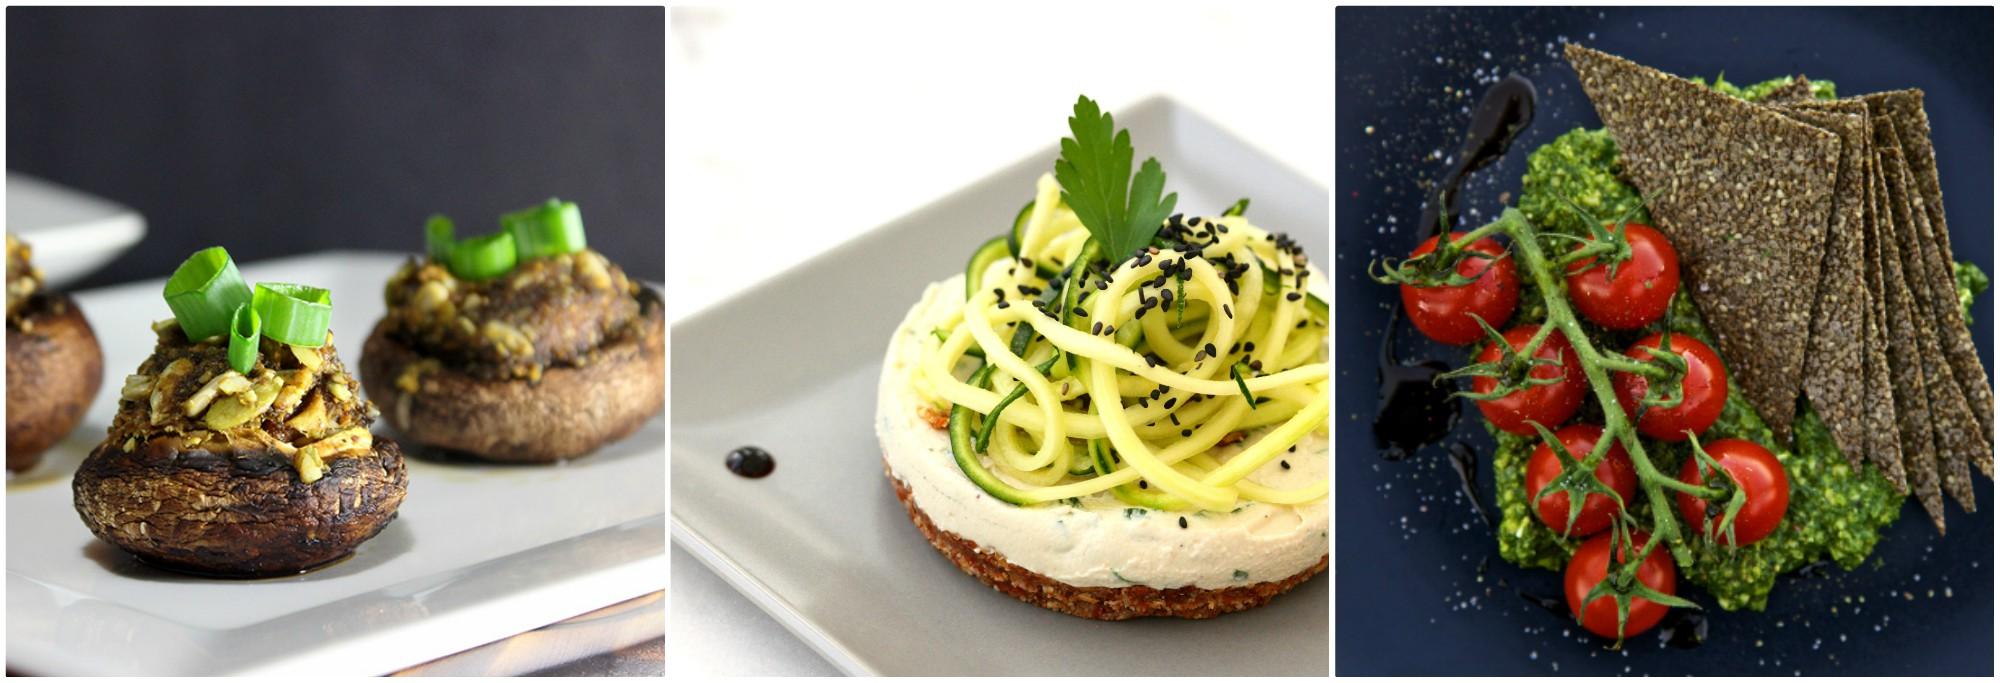 Mes recommandations de livres de cuisine crue en fran ais - Cuisine crue et vivante ...